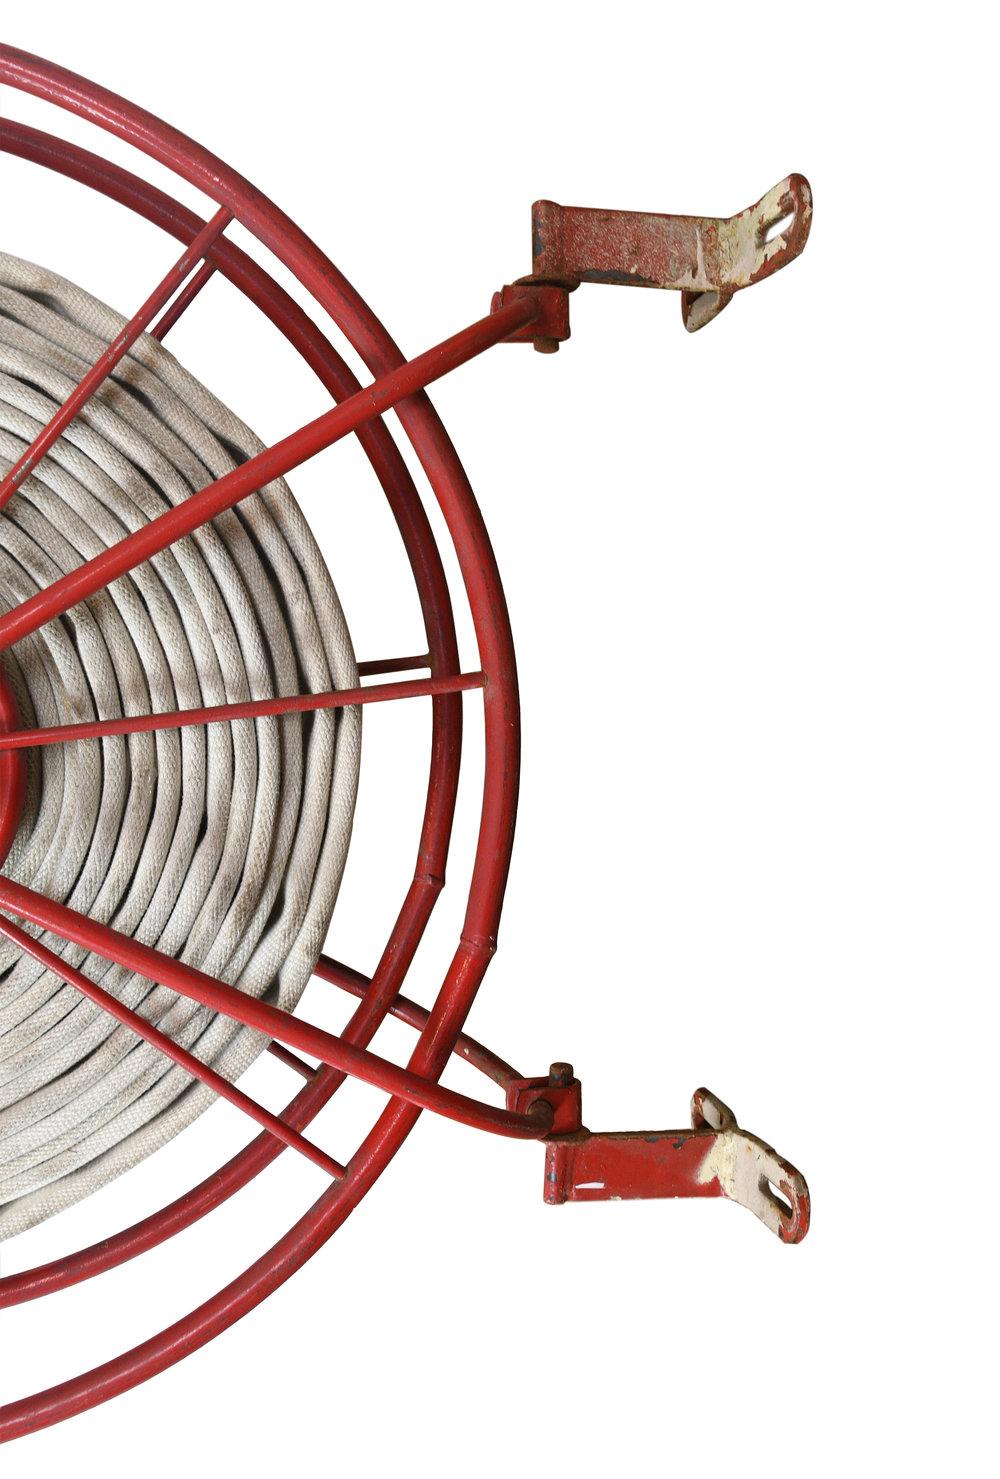 47862-fire-hose-wheel-15.jpg